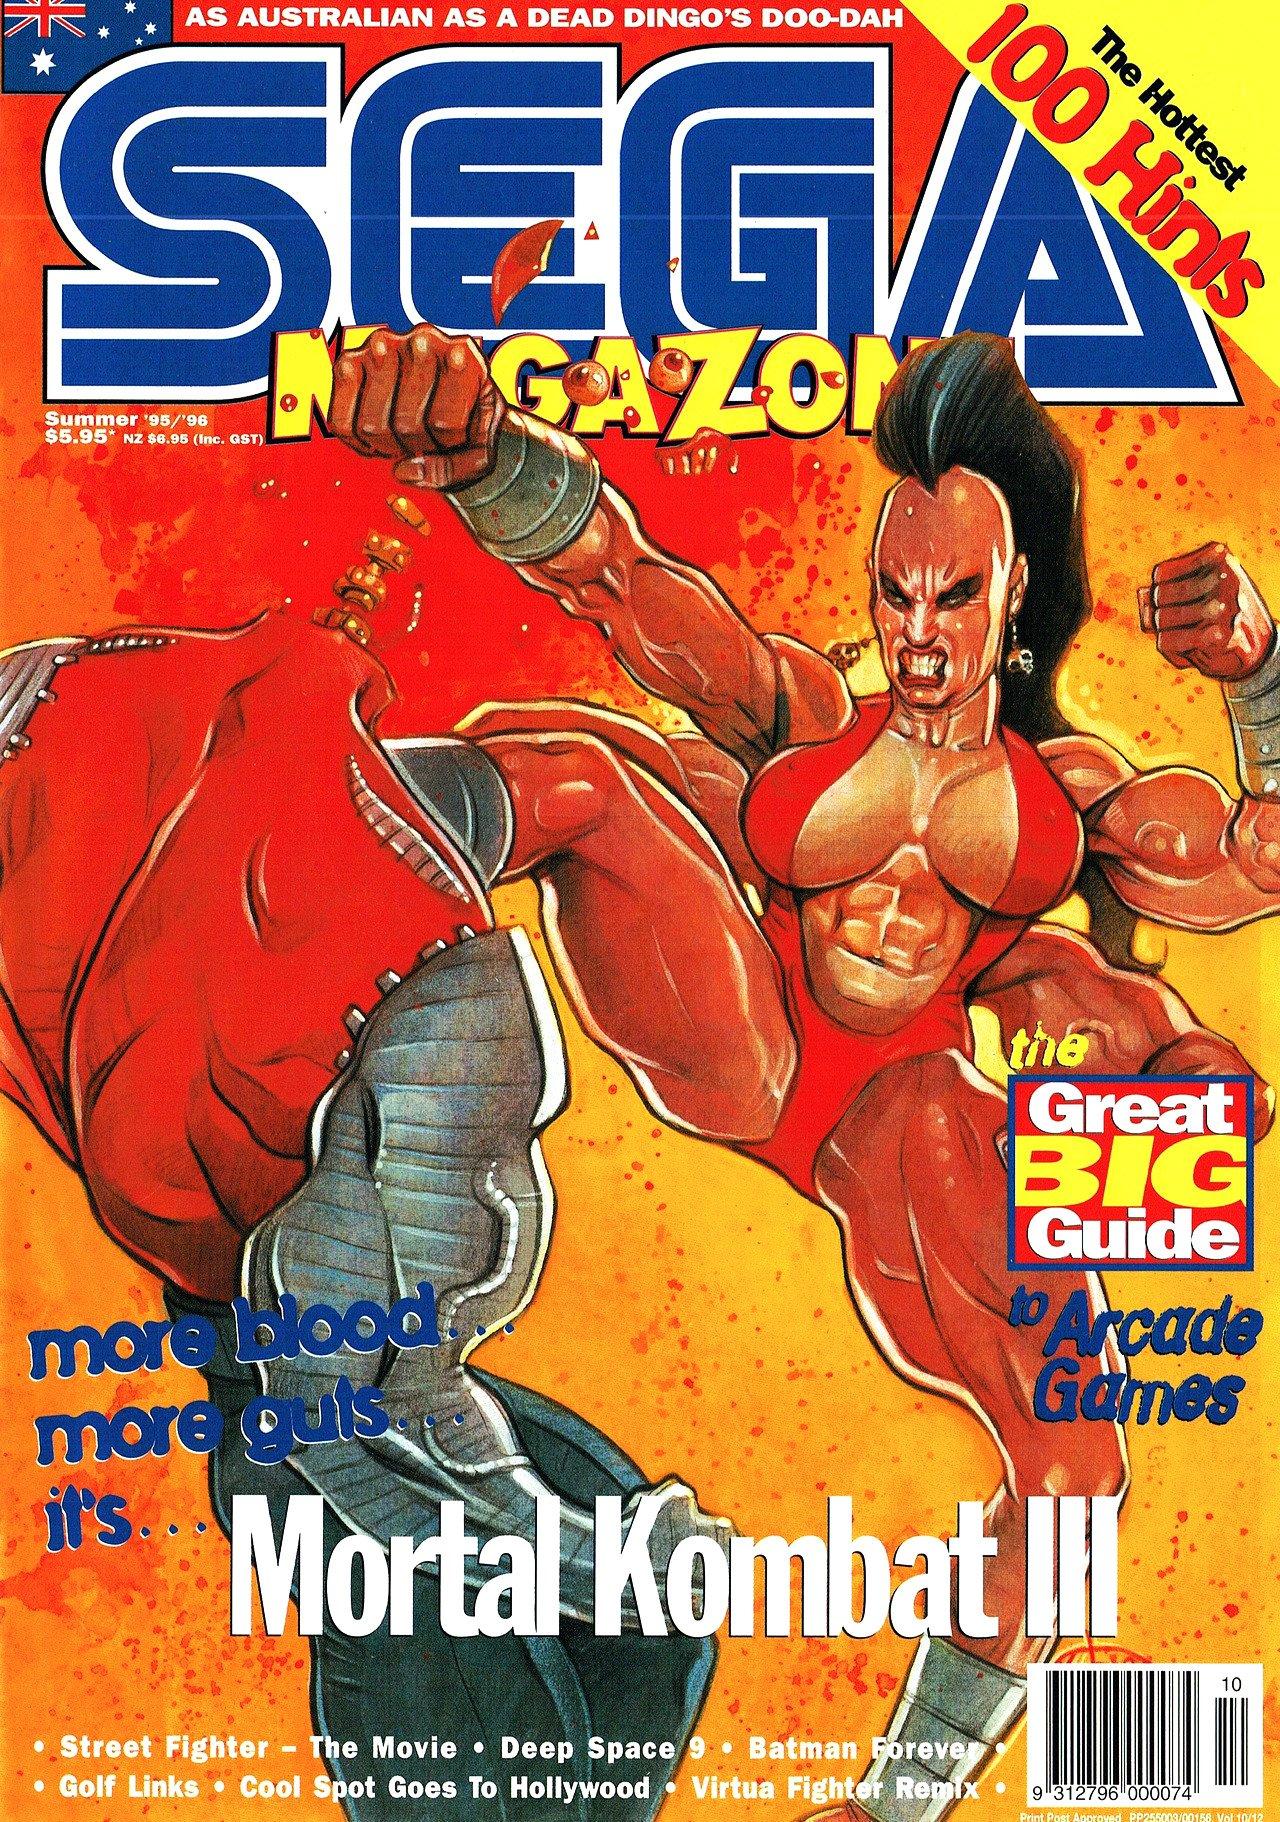 Sega MegaZone 56 (Summer 1995 / 96)